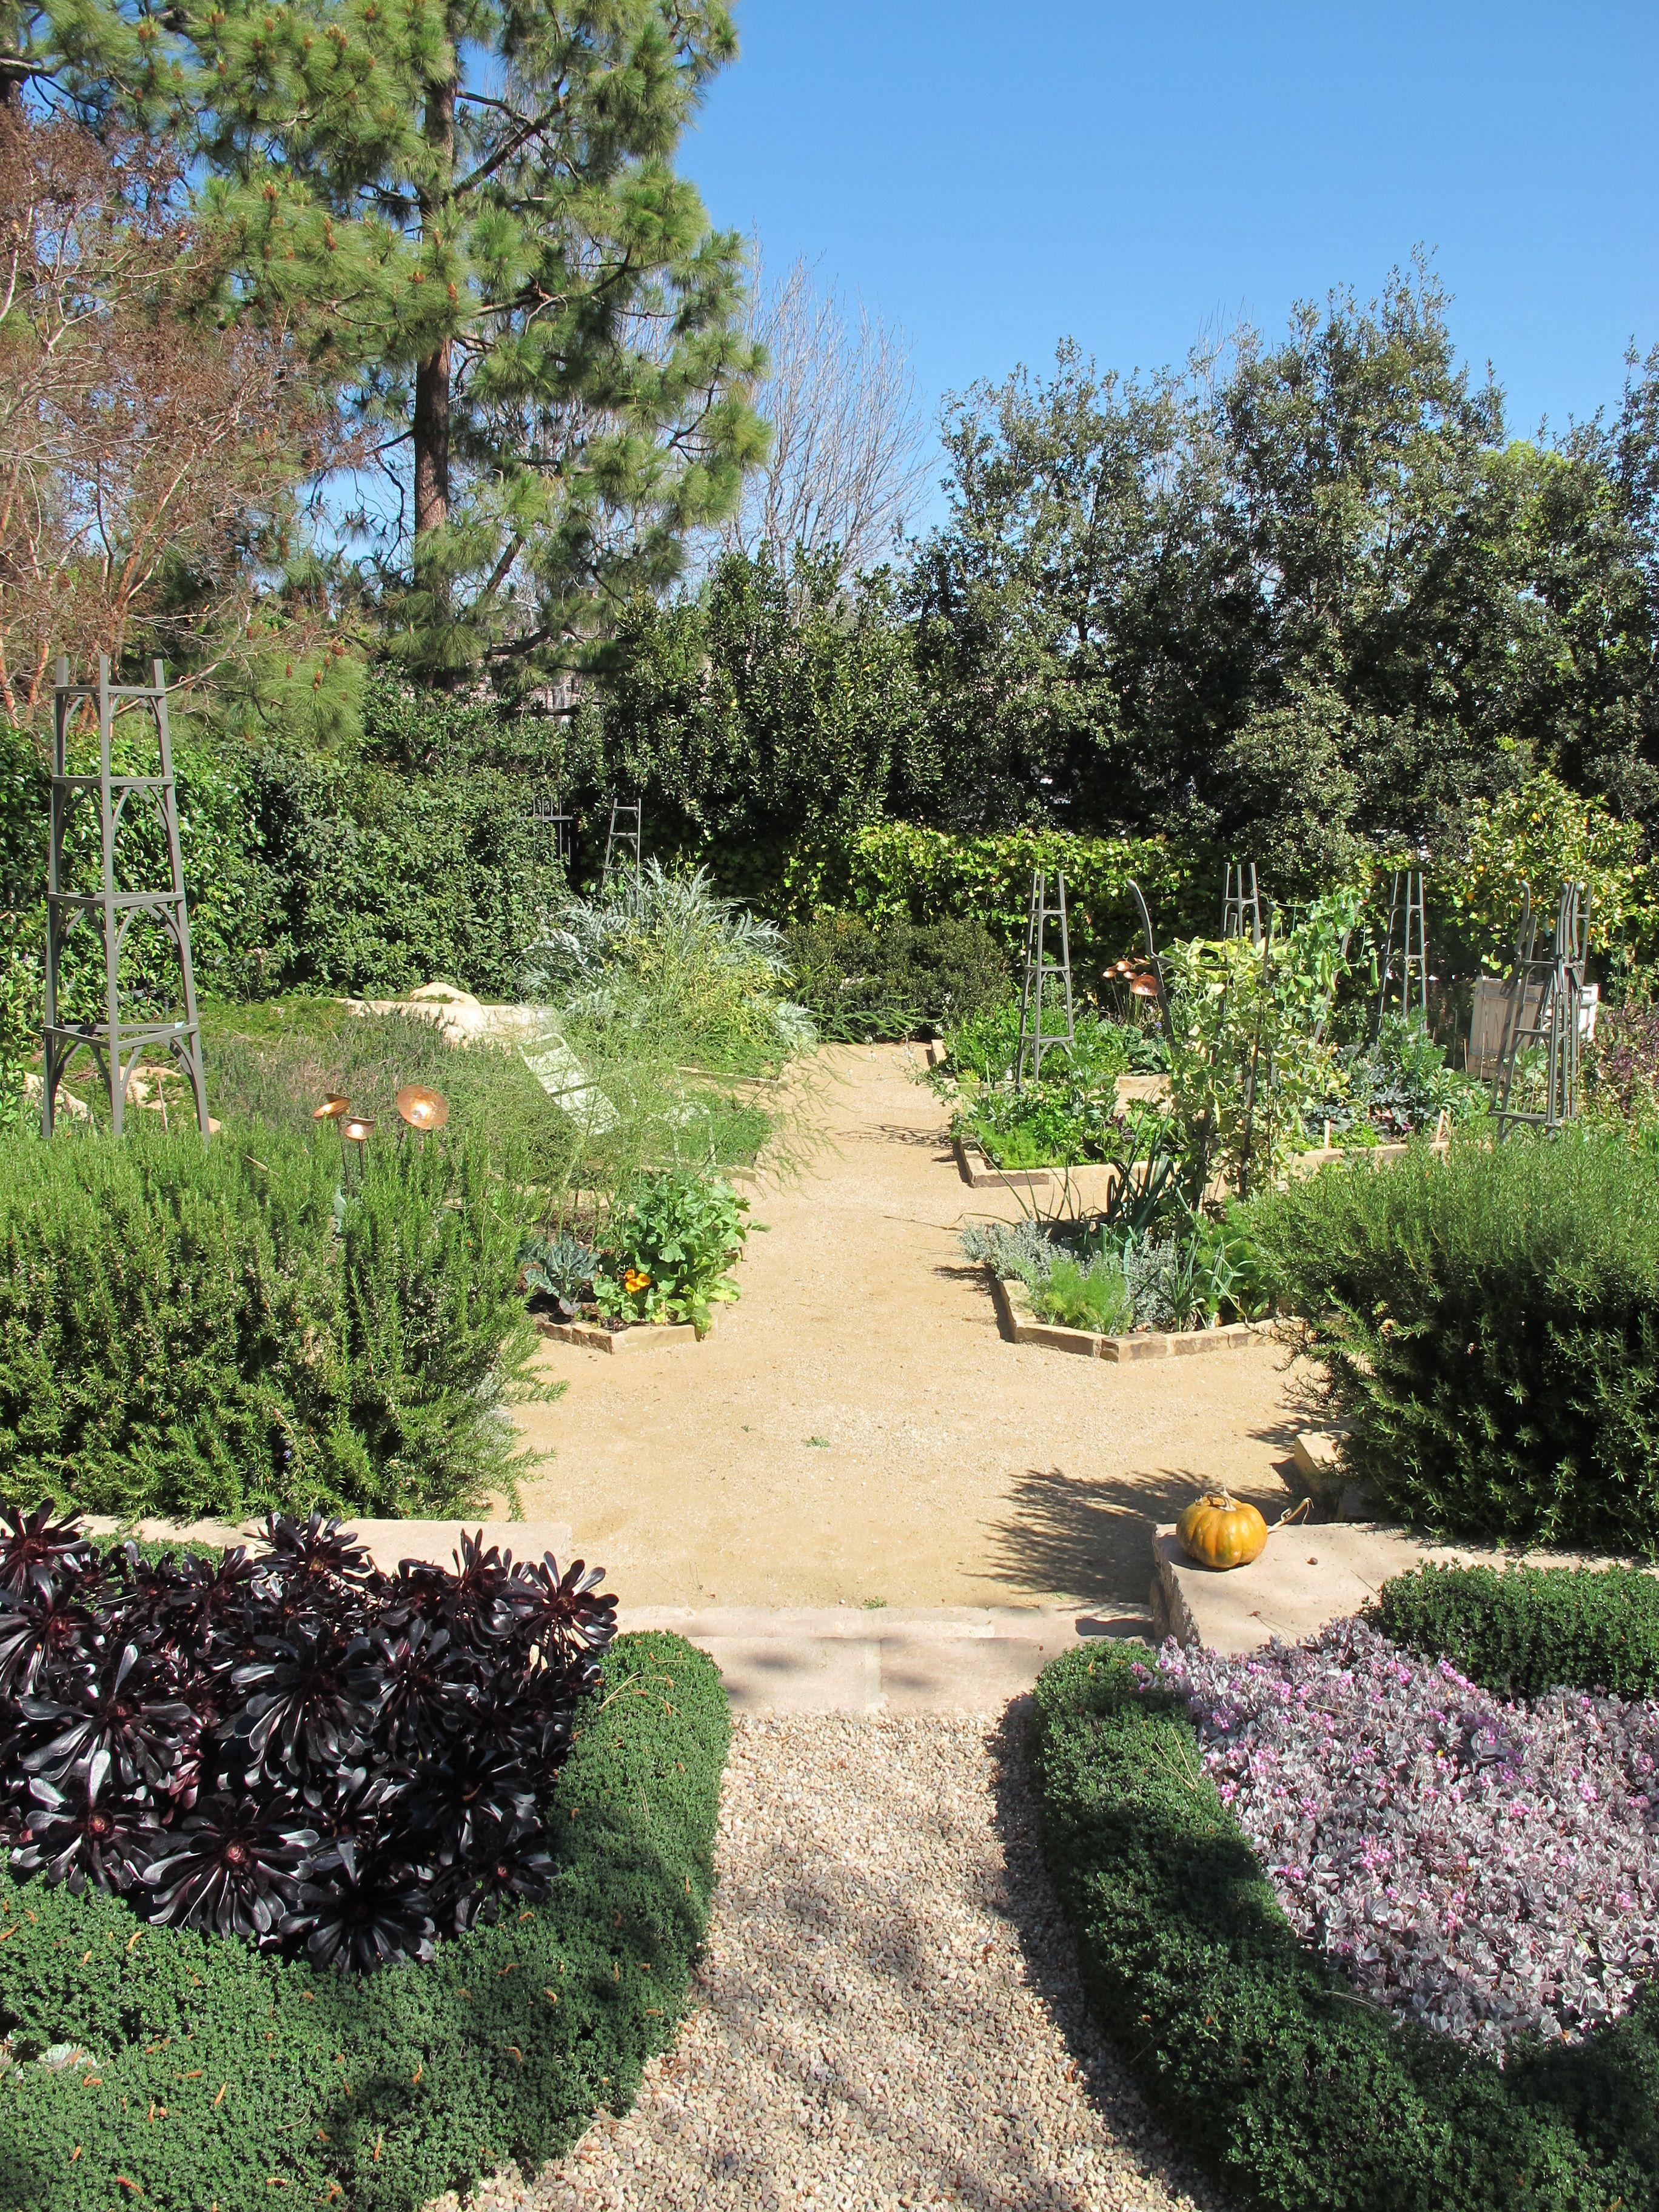 143609720aefe9965147554b32b16d1d - Edgar's Gardening And Tree Service